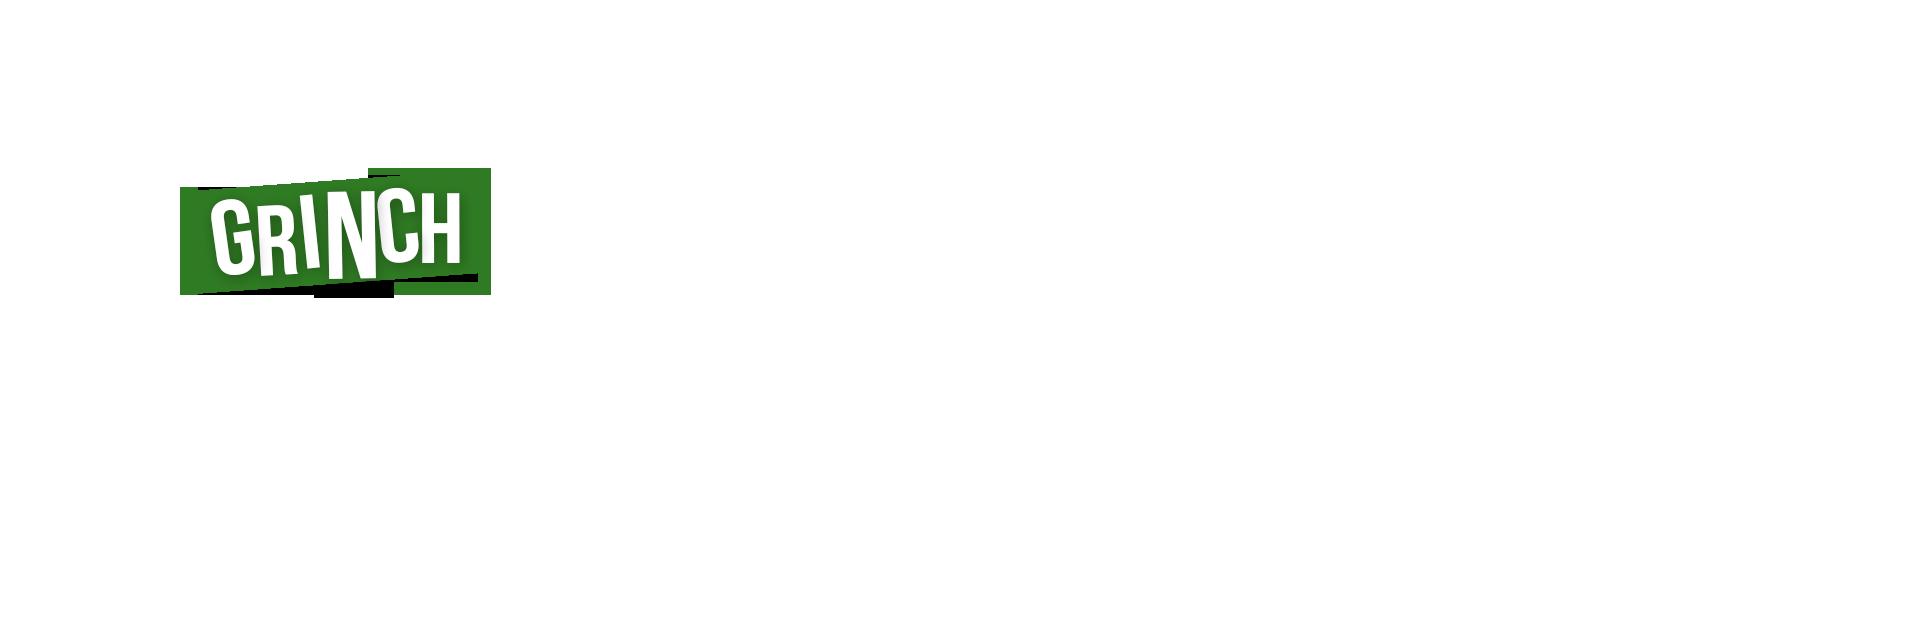 246_1-2